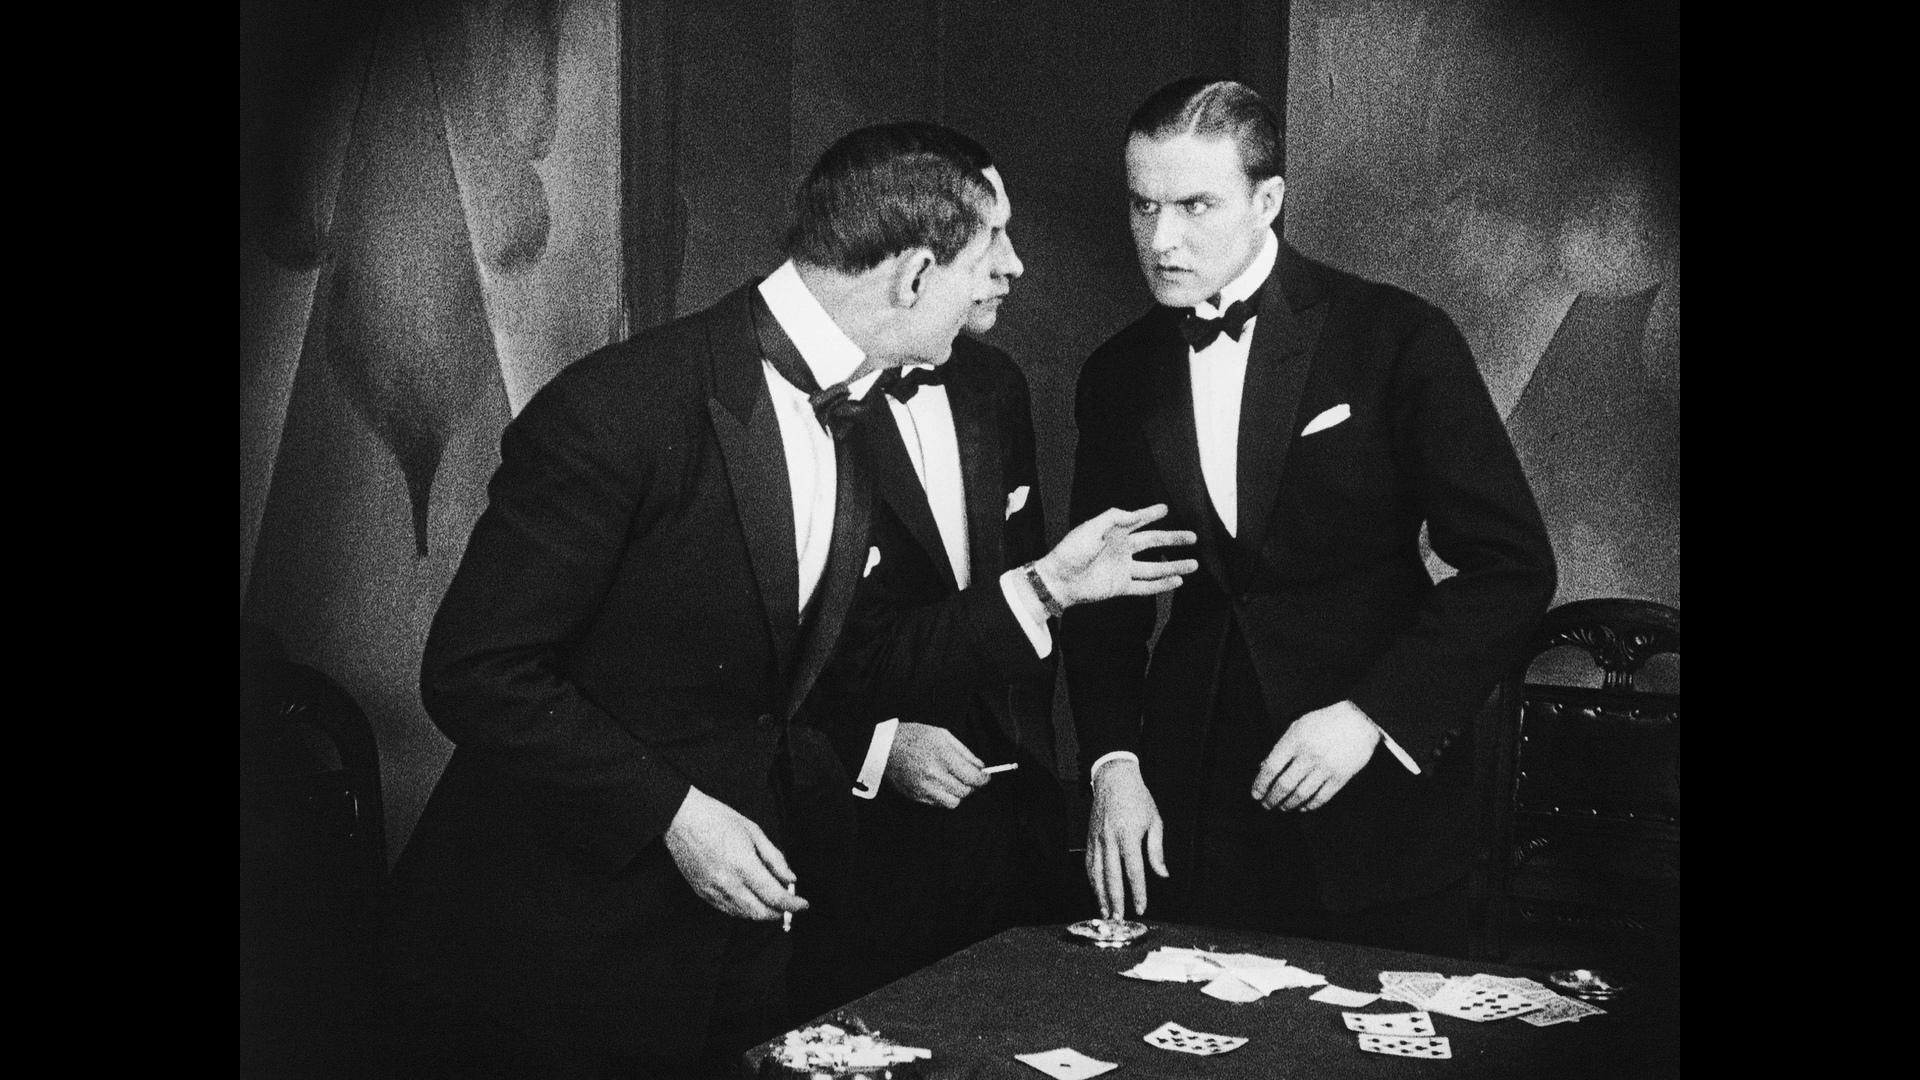 https://i1.wp.com/www.dvdbeaver.com/film4/blu-ray_reviews_60/dr_mabuse_the_gambler_blu-ray_/large/large_dr_mabuse_gambler_blu-ray_X01.jpg